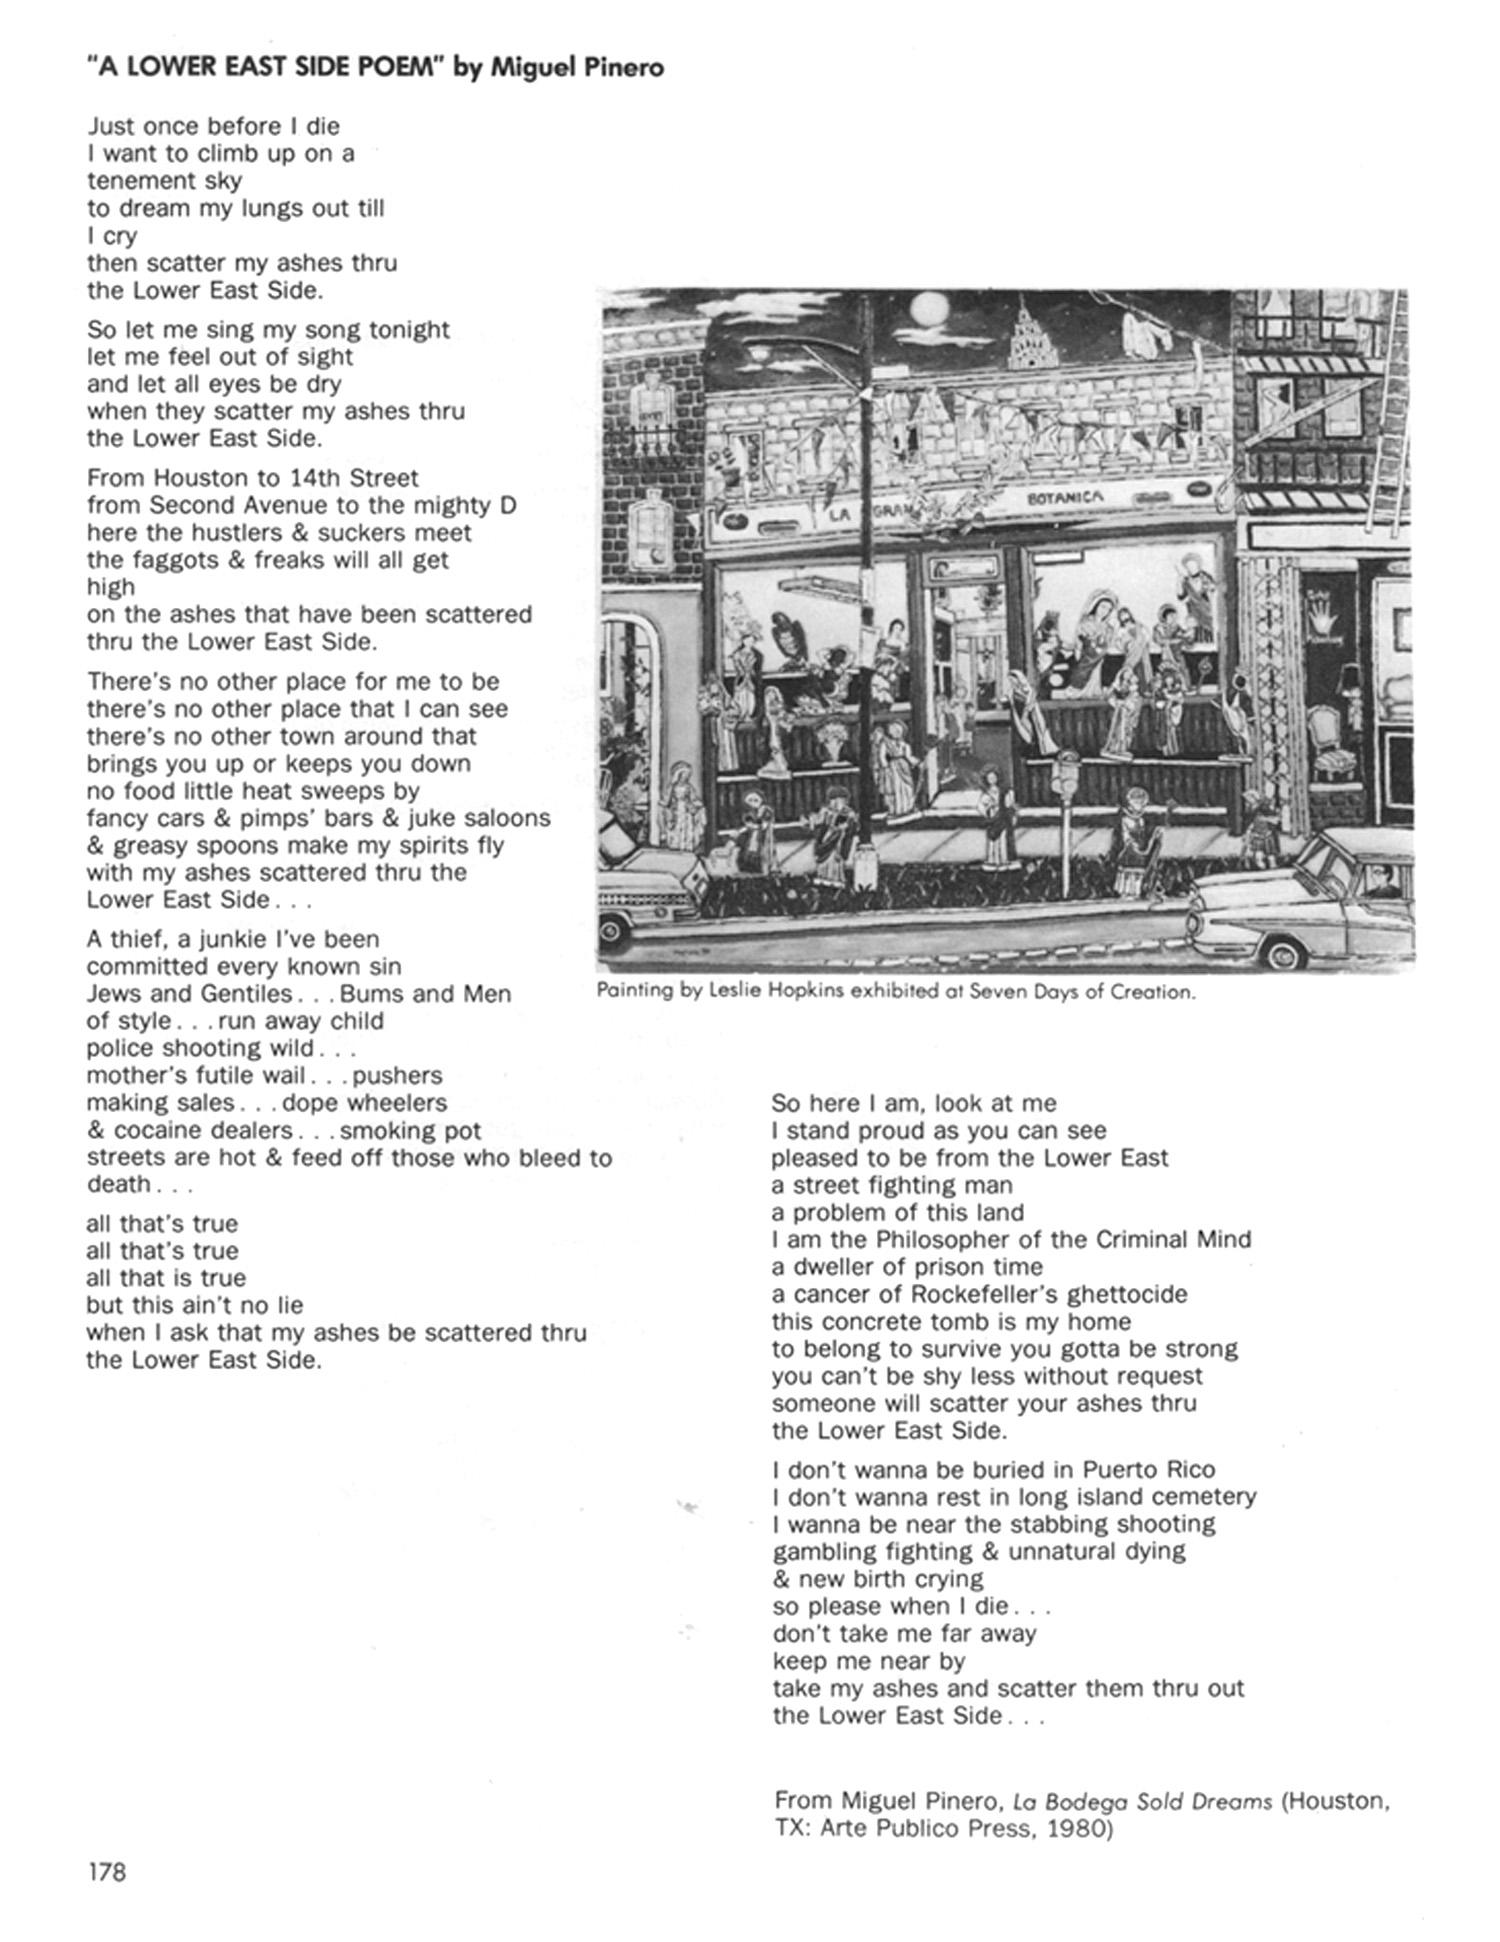 abc-no-rio-poetry-7.jpg